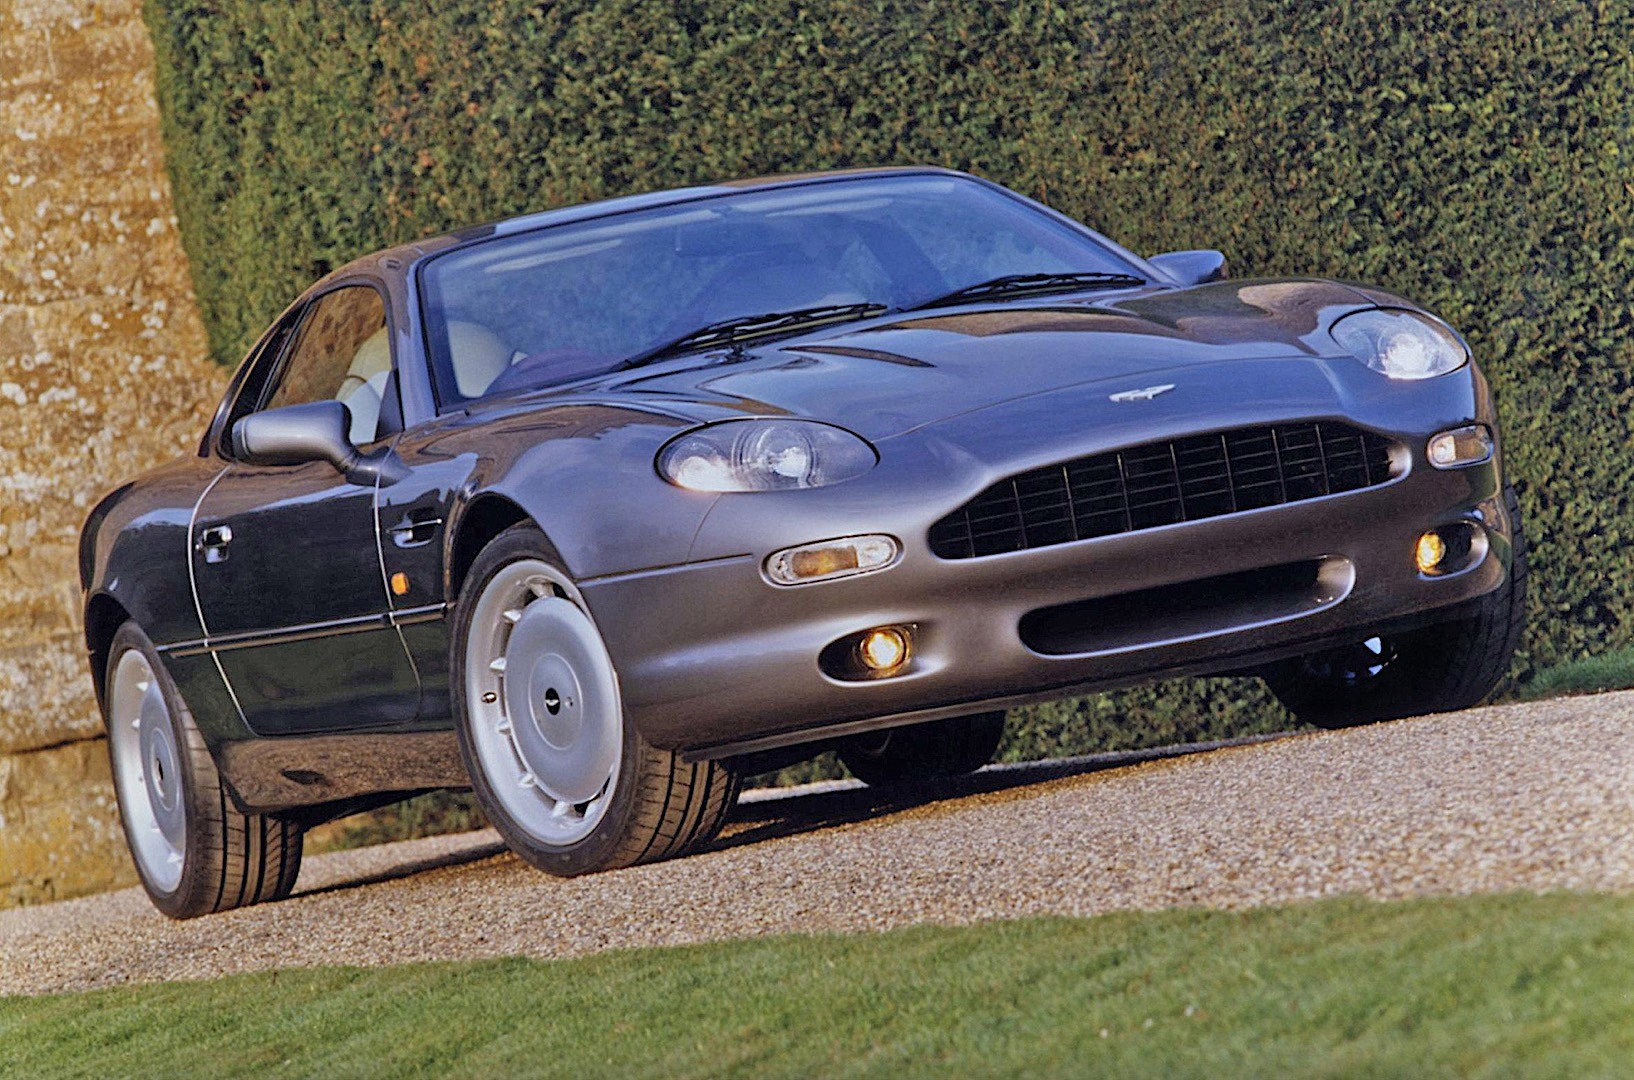 Aston Martin Db7 Coupe Specs  U0026 Photos - 1993  1994  1995  1996  1997  1998  1999